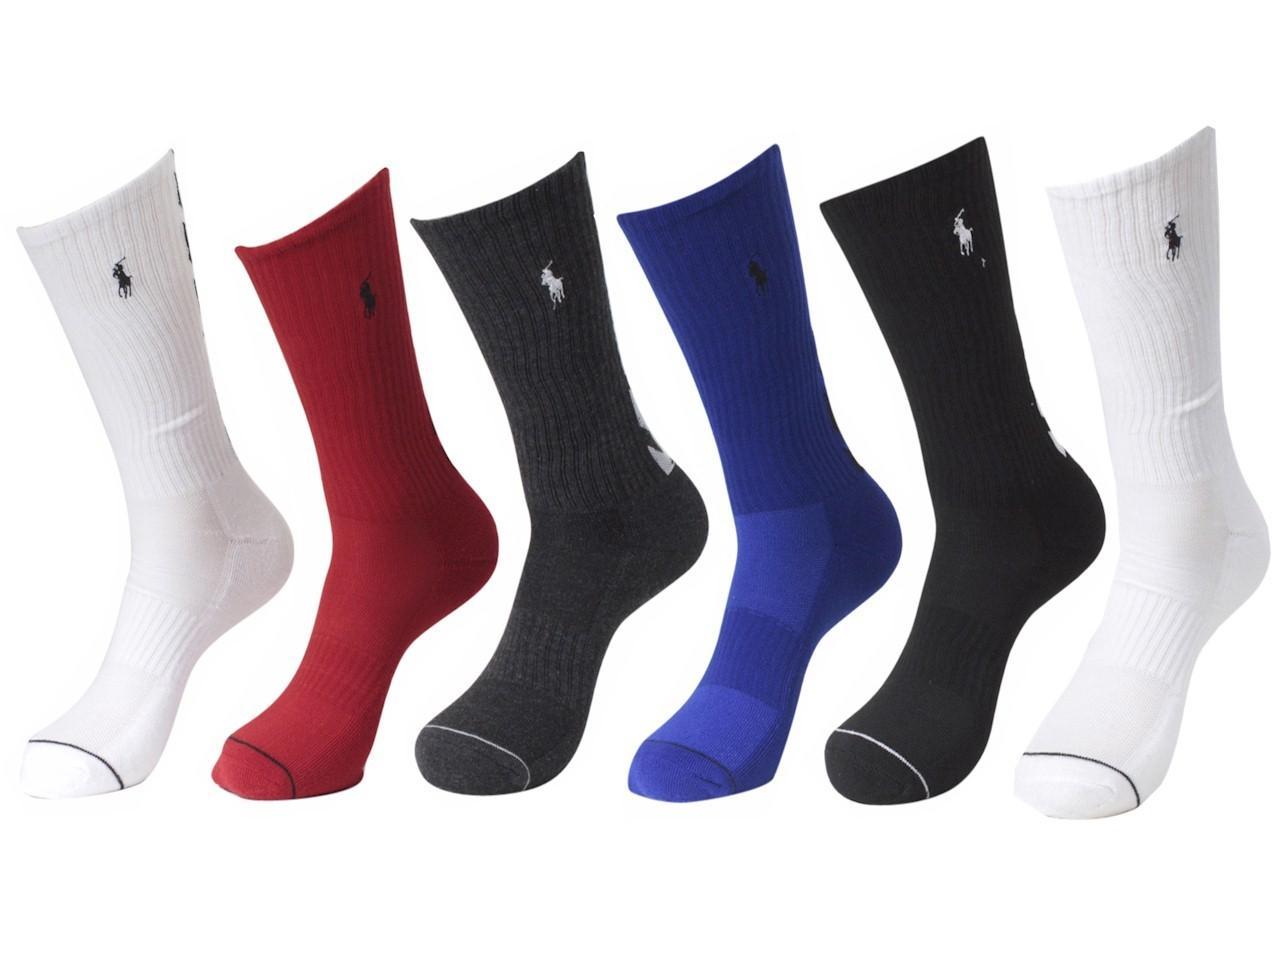 4416844c6d3c Lyst - Polo Ralph Lauren 6-pairs Chevron Assorted Crew Socks Sz: 10 ...